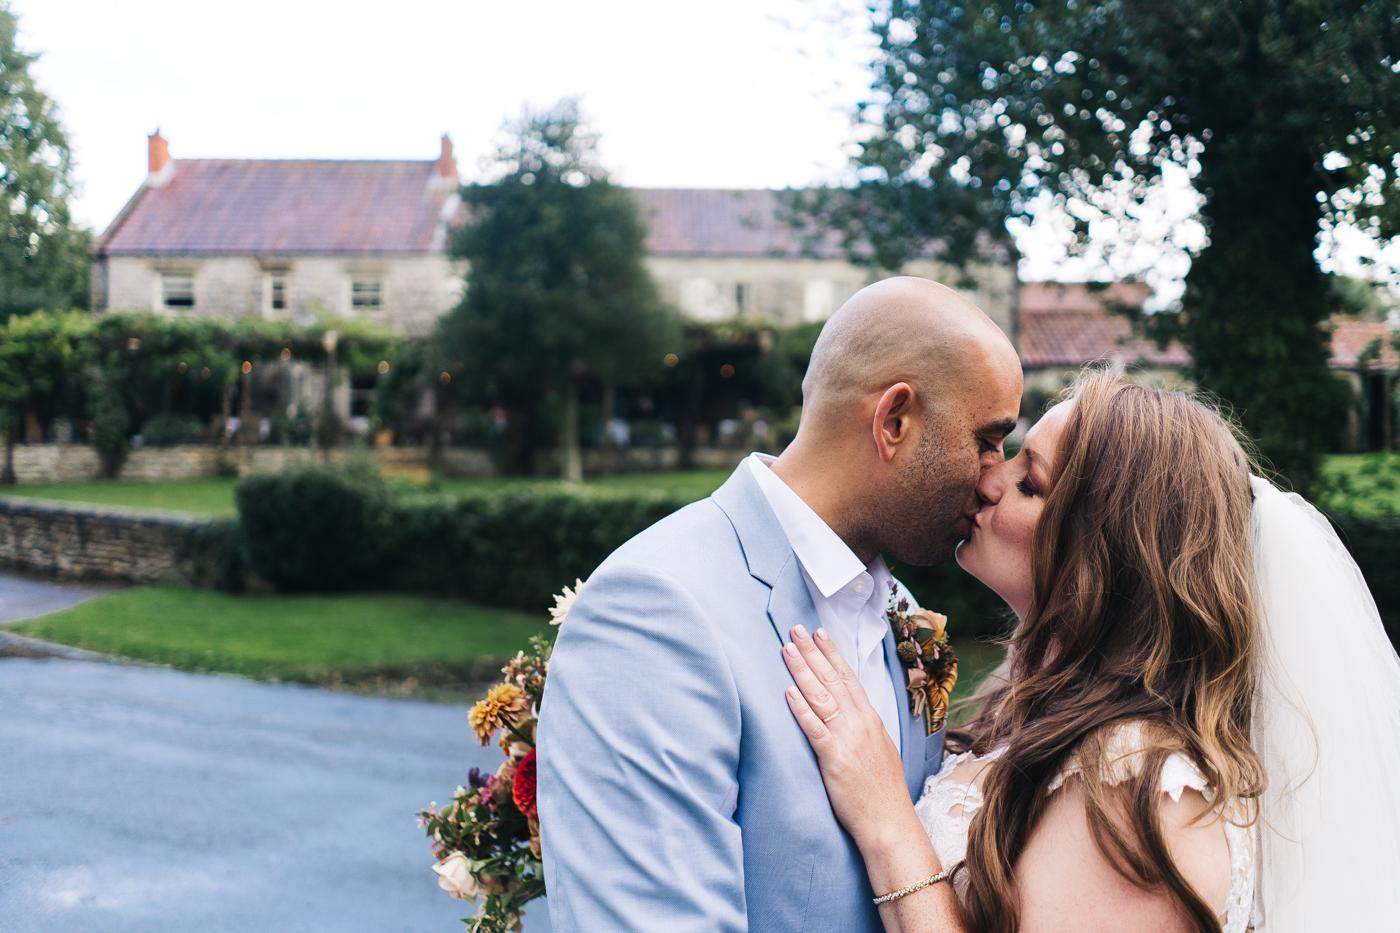 wedding-at-the-pheasant-harome-helmsley-north-yorkshire-wedding-photographer-0028.jpg